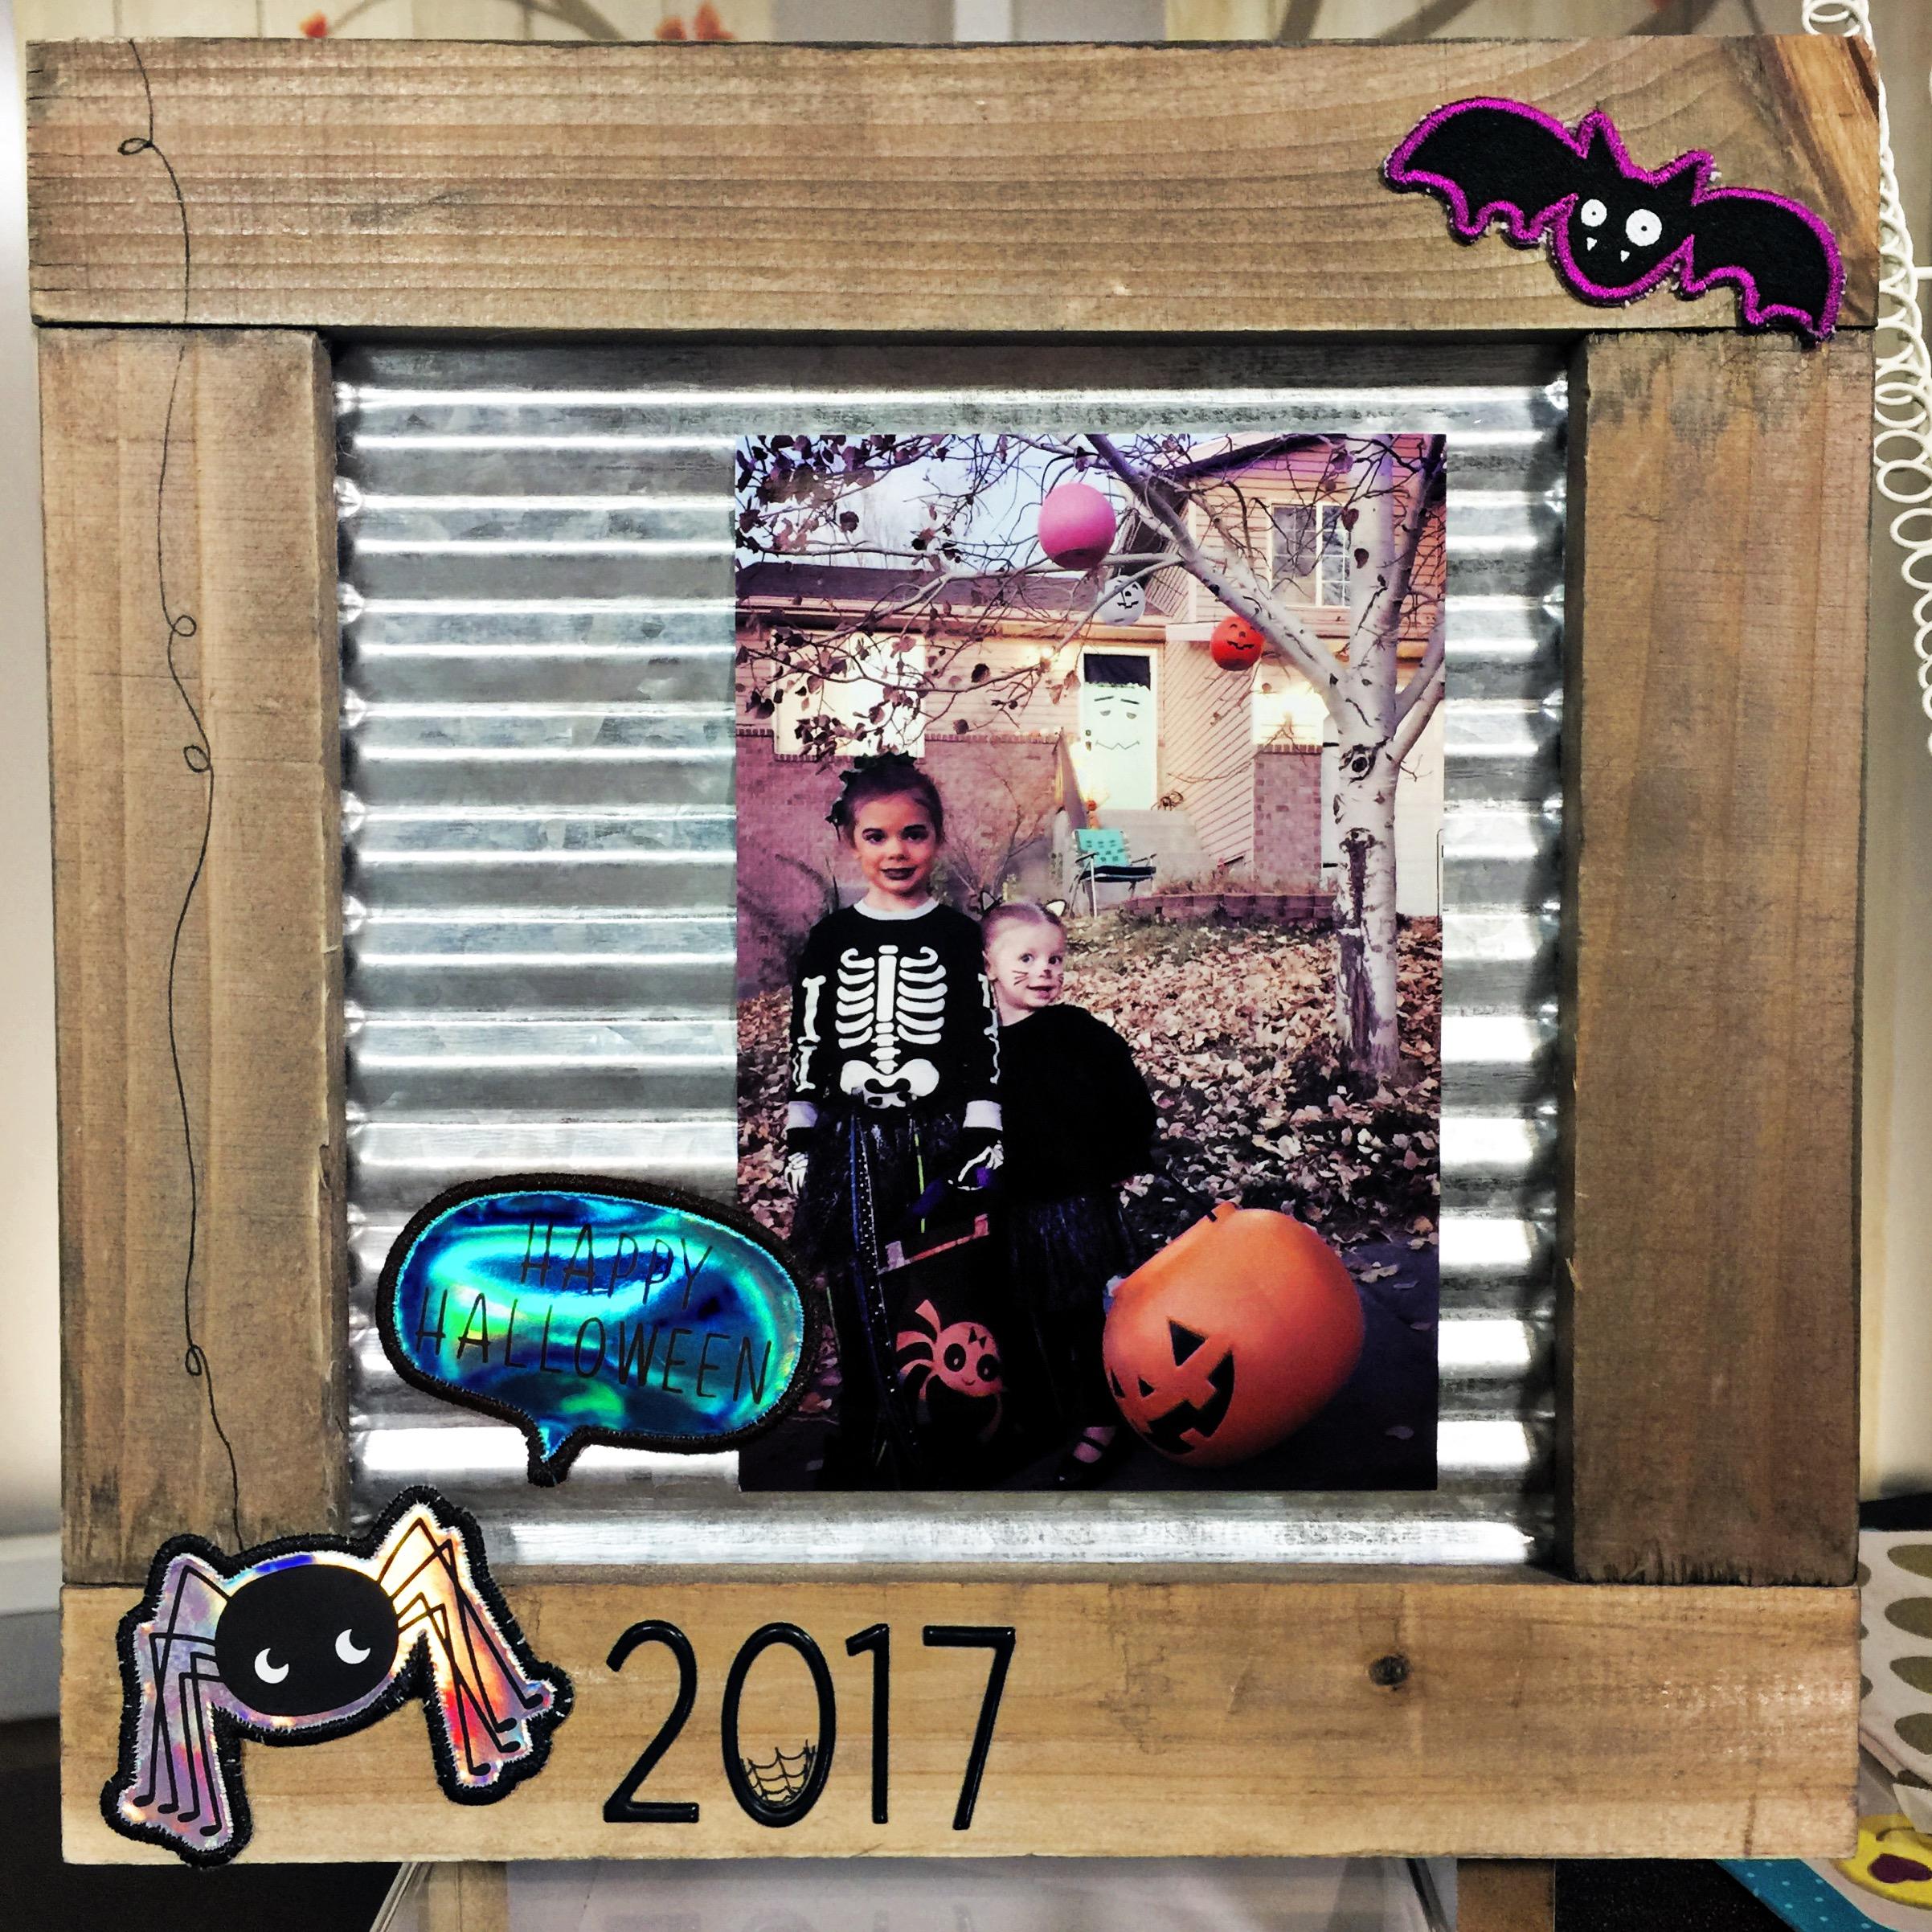 patches_halloween.JPG